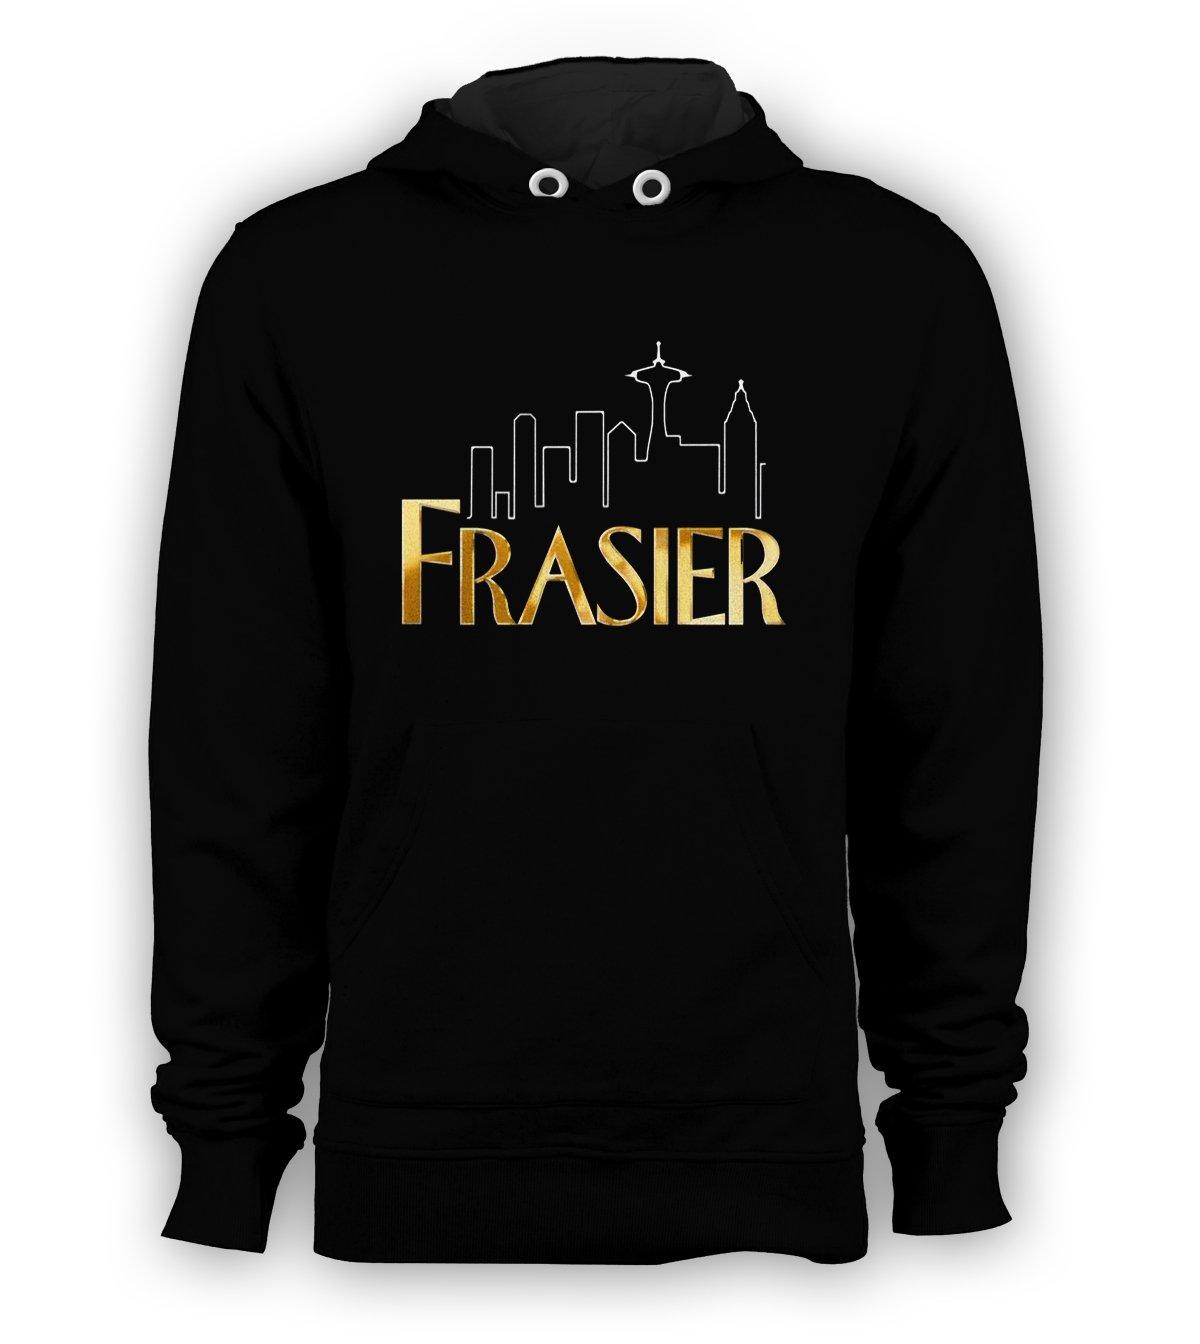 Frasier Sitcom NBC Pullover Hoodie Men Sweatshirts Size S to 3XL New Black